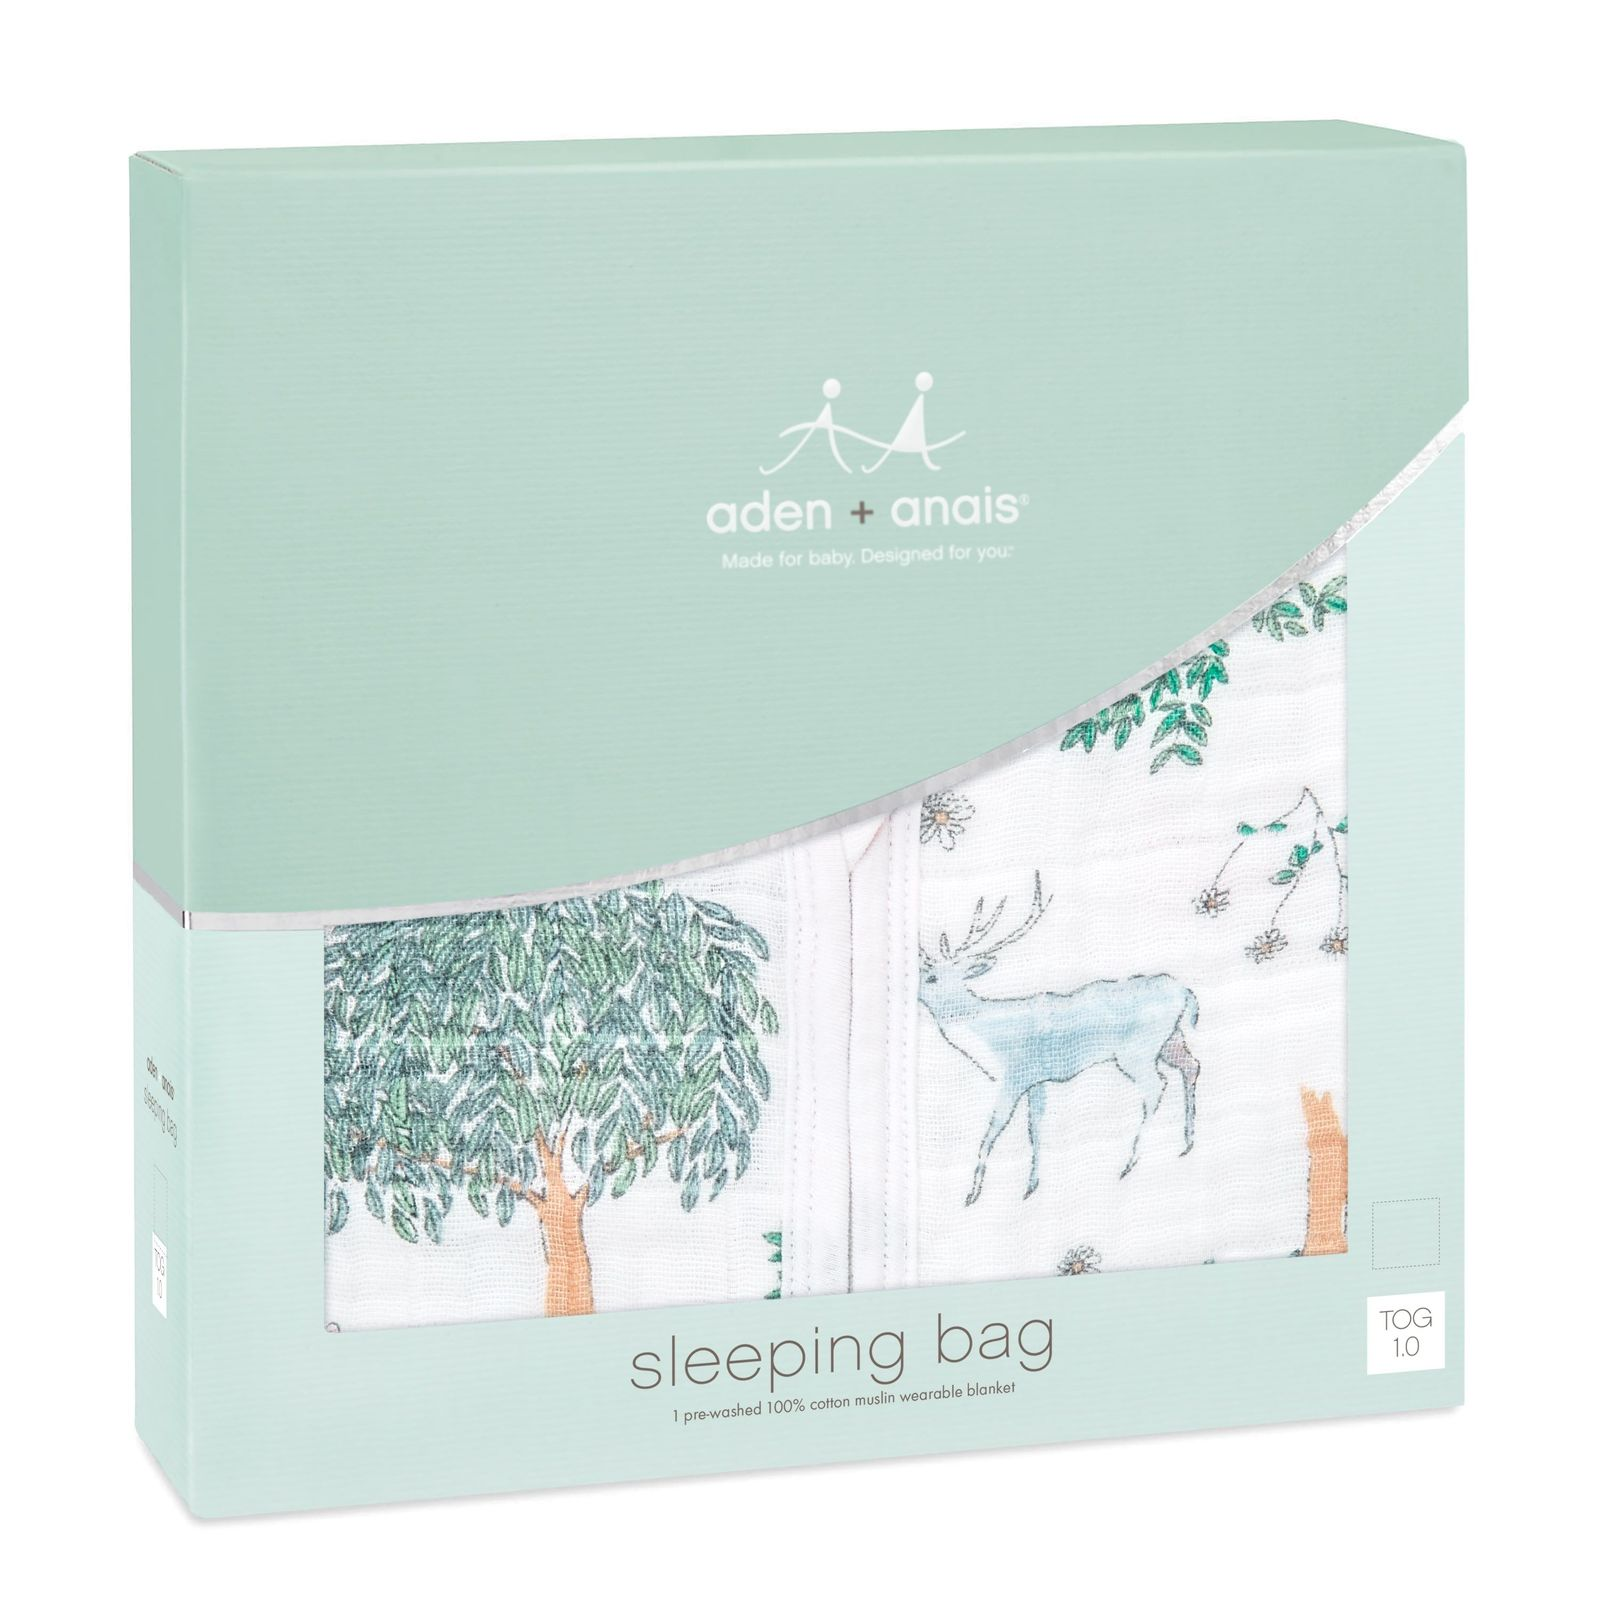 Aden + Anais: Classic Muslin Sleeping Bag - Forest Fantasy - Deer (Medium) image